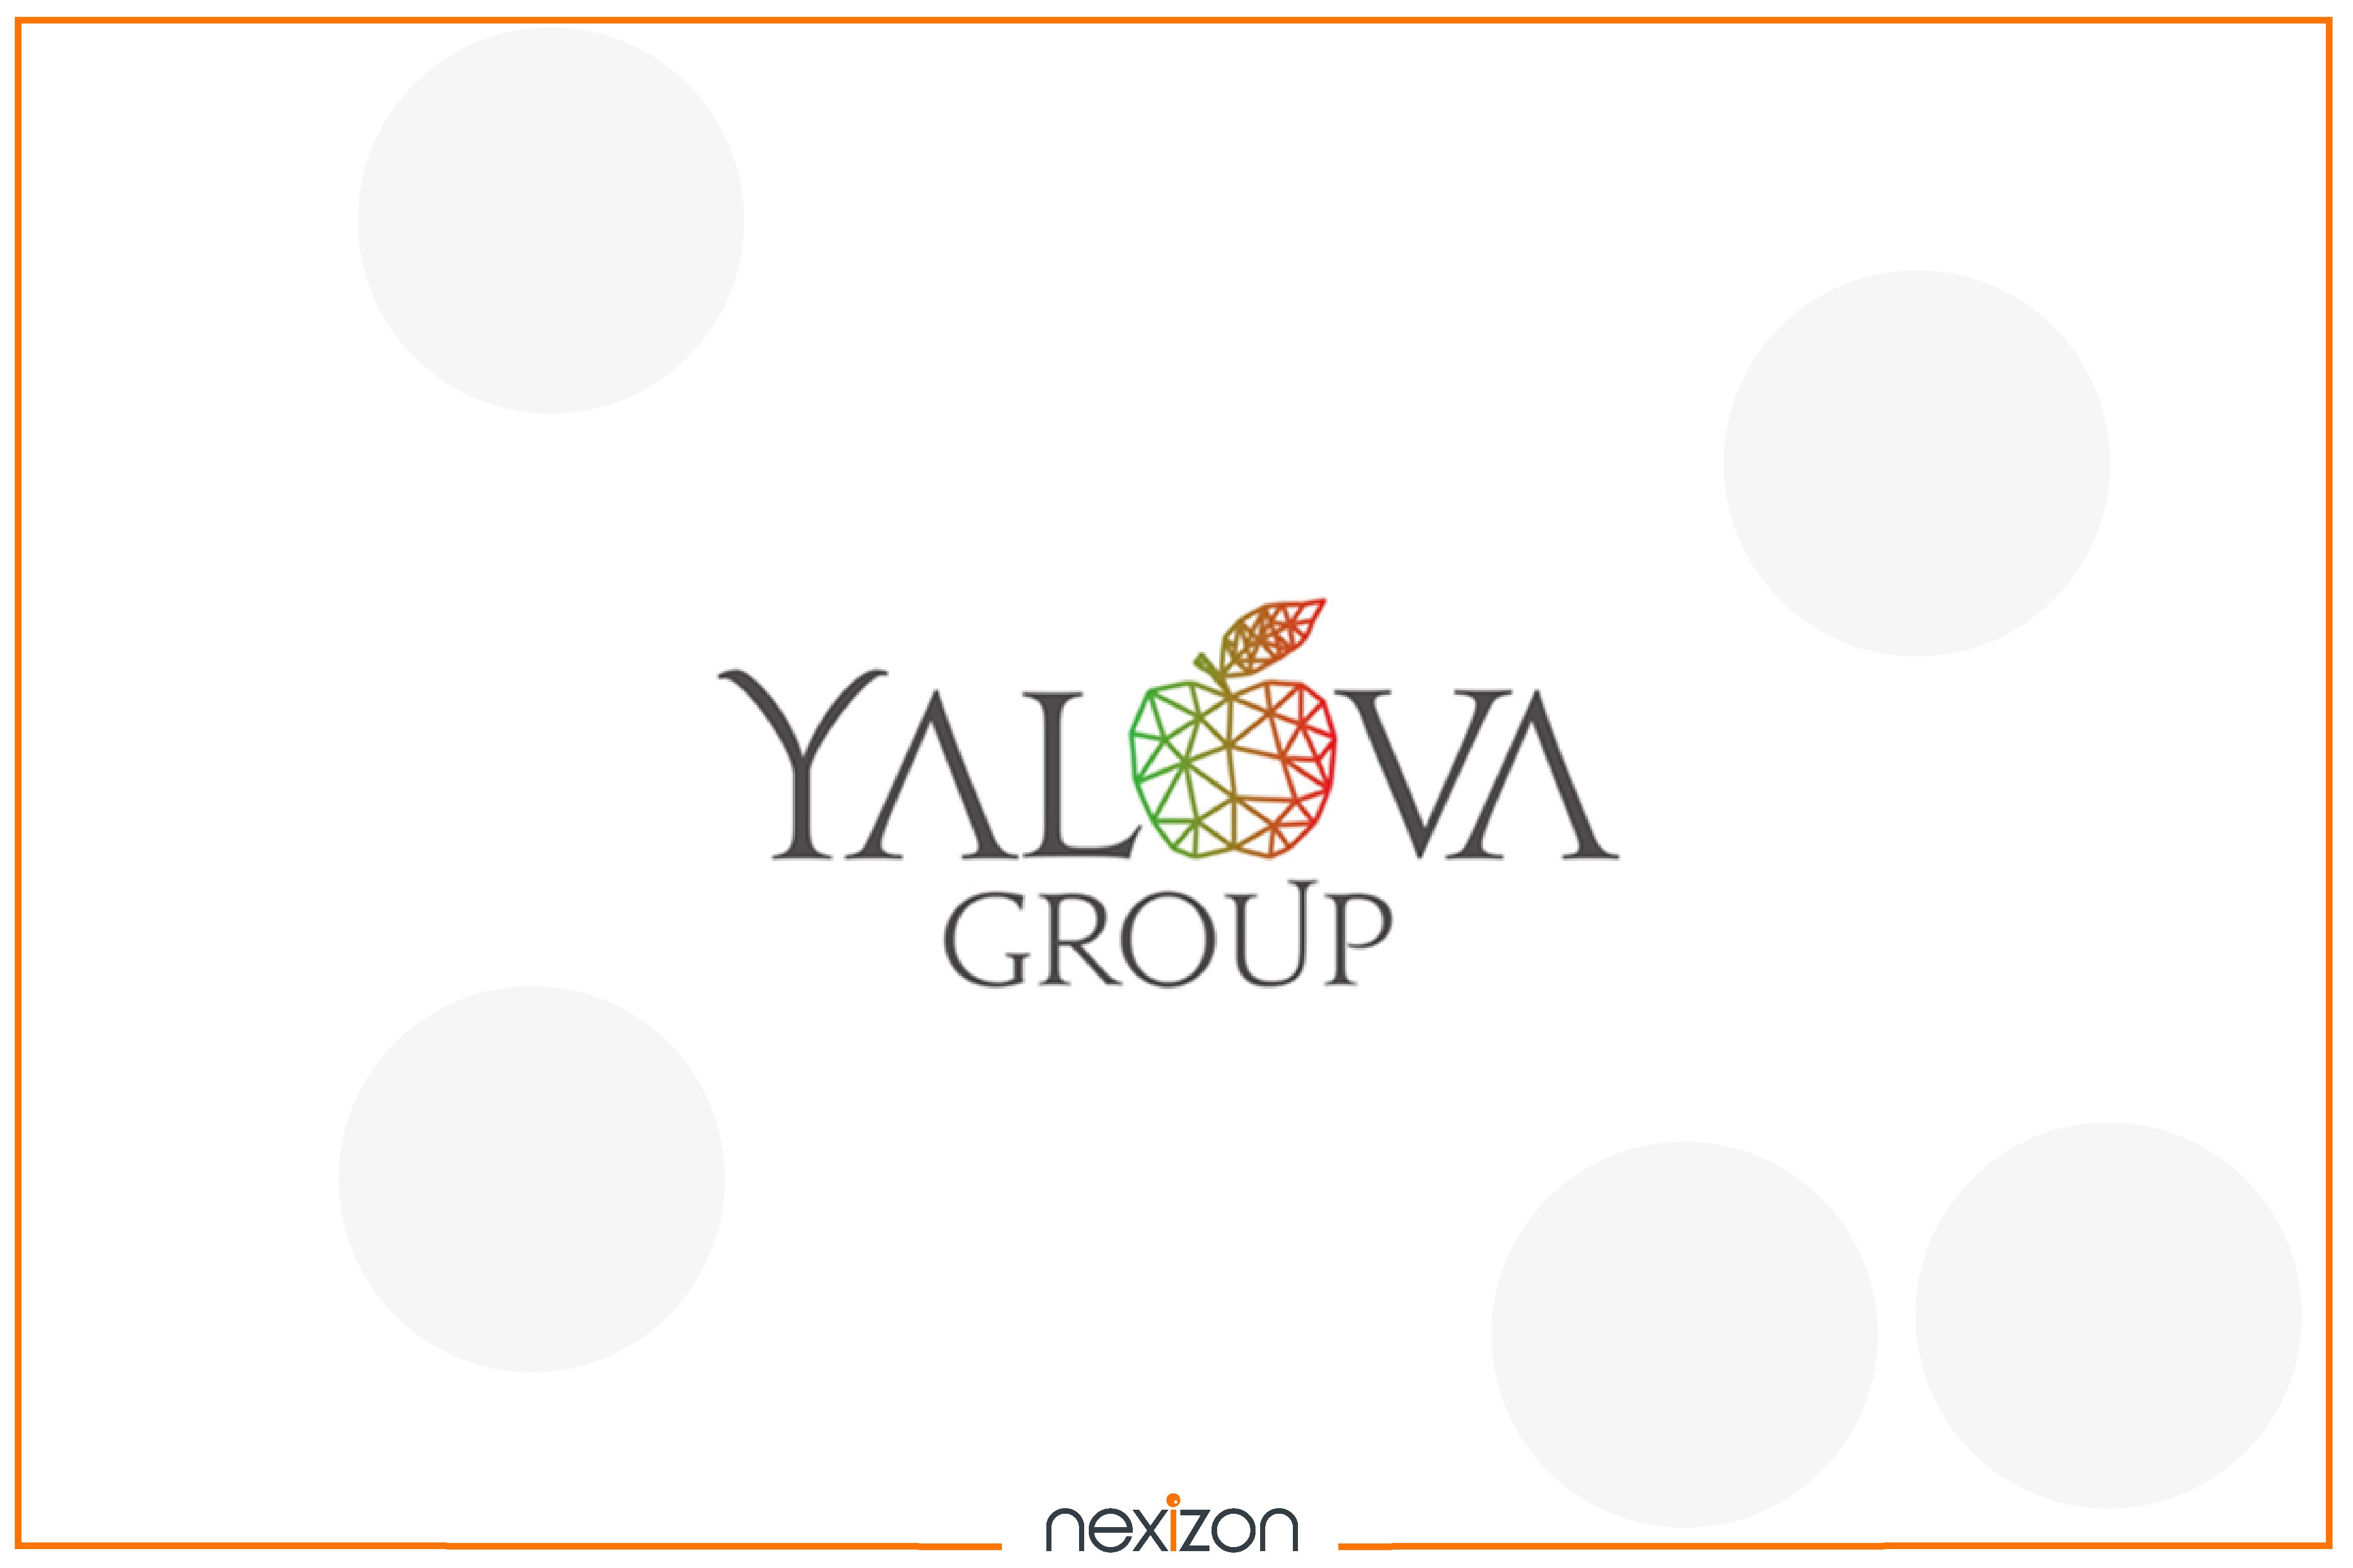 Yalova Group has integrated nexizon systems into its facilities!